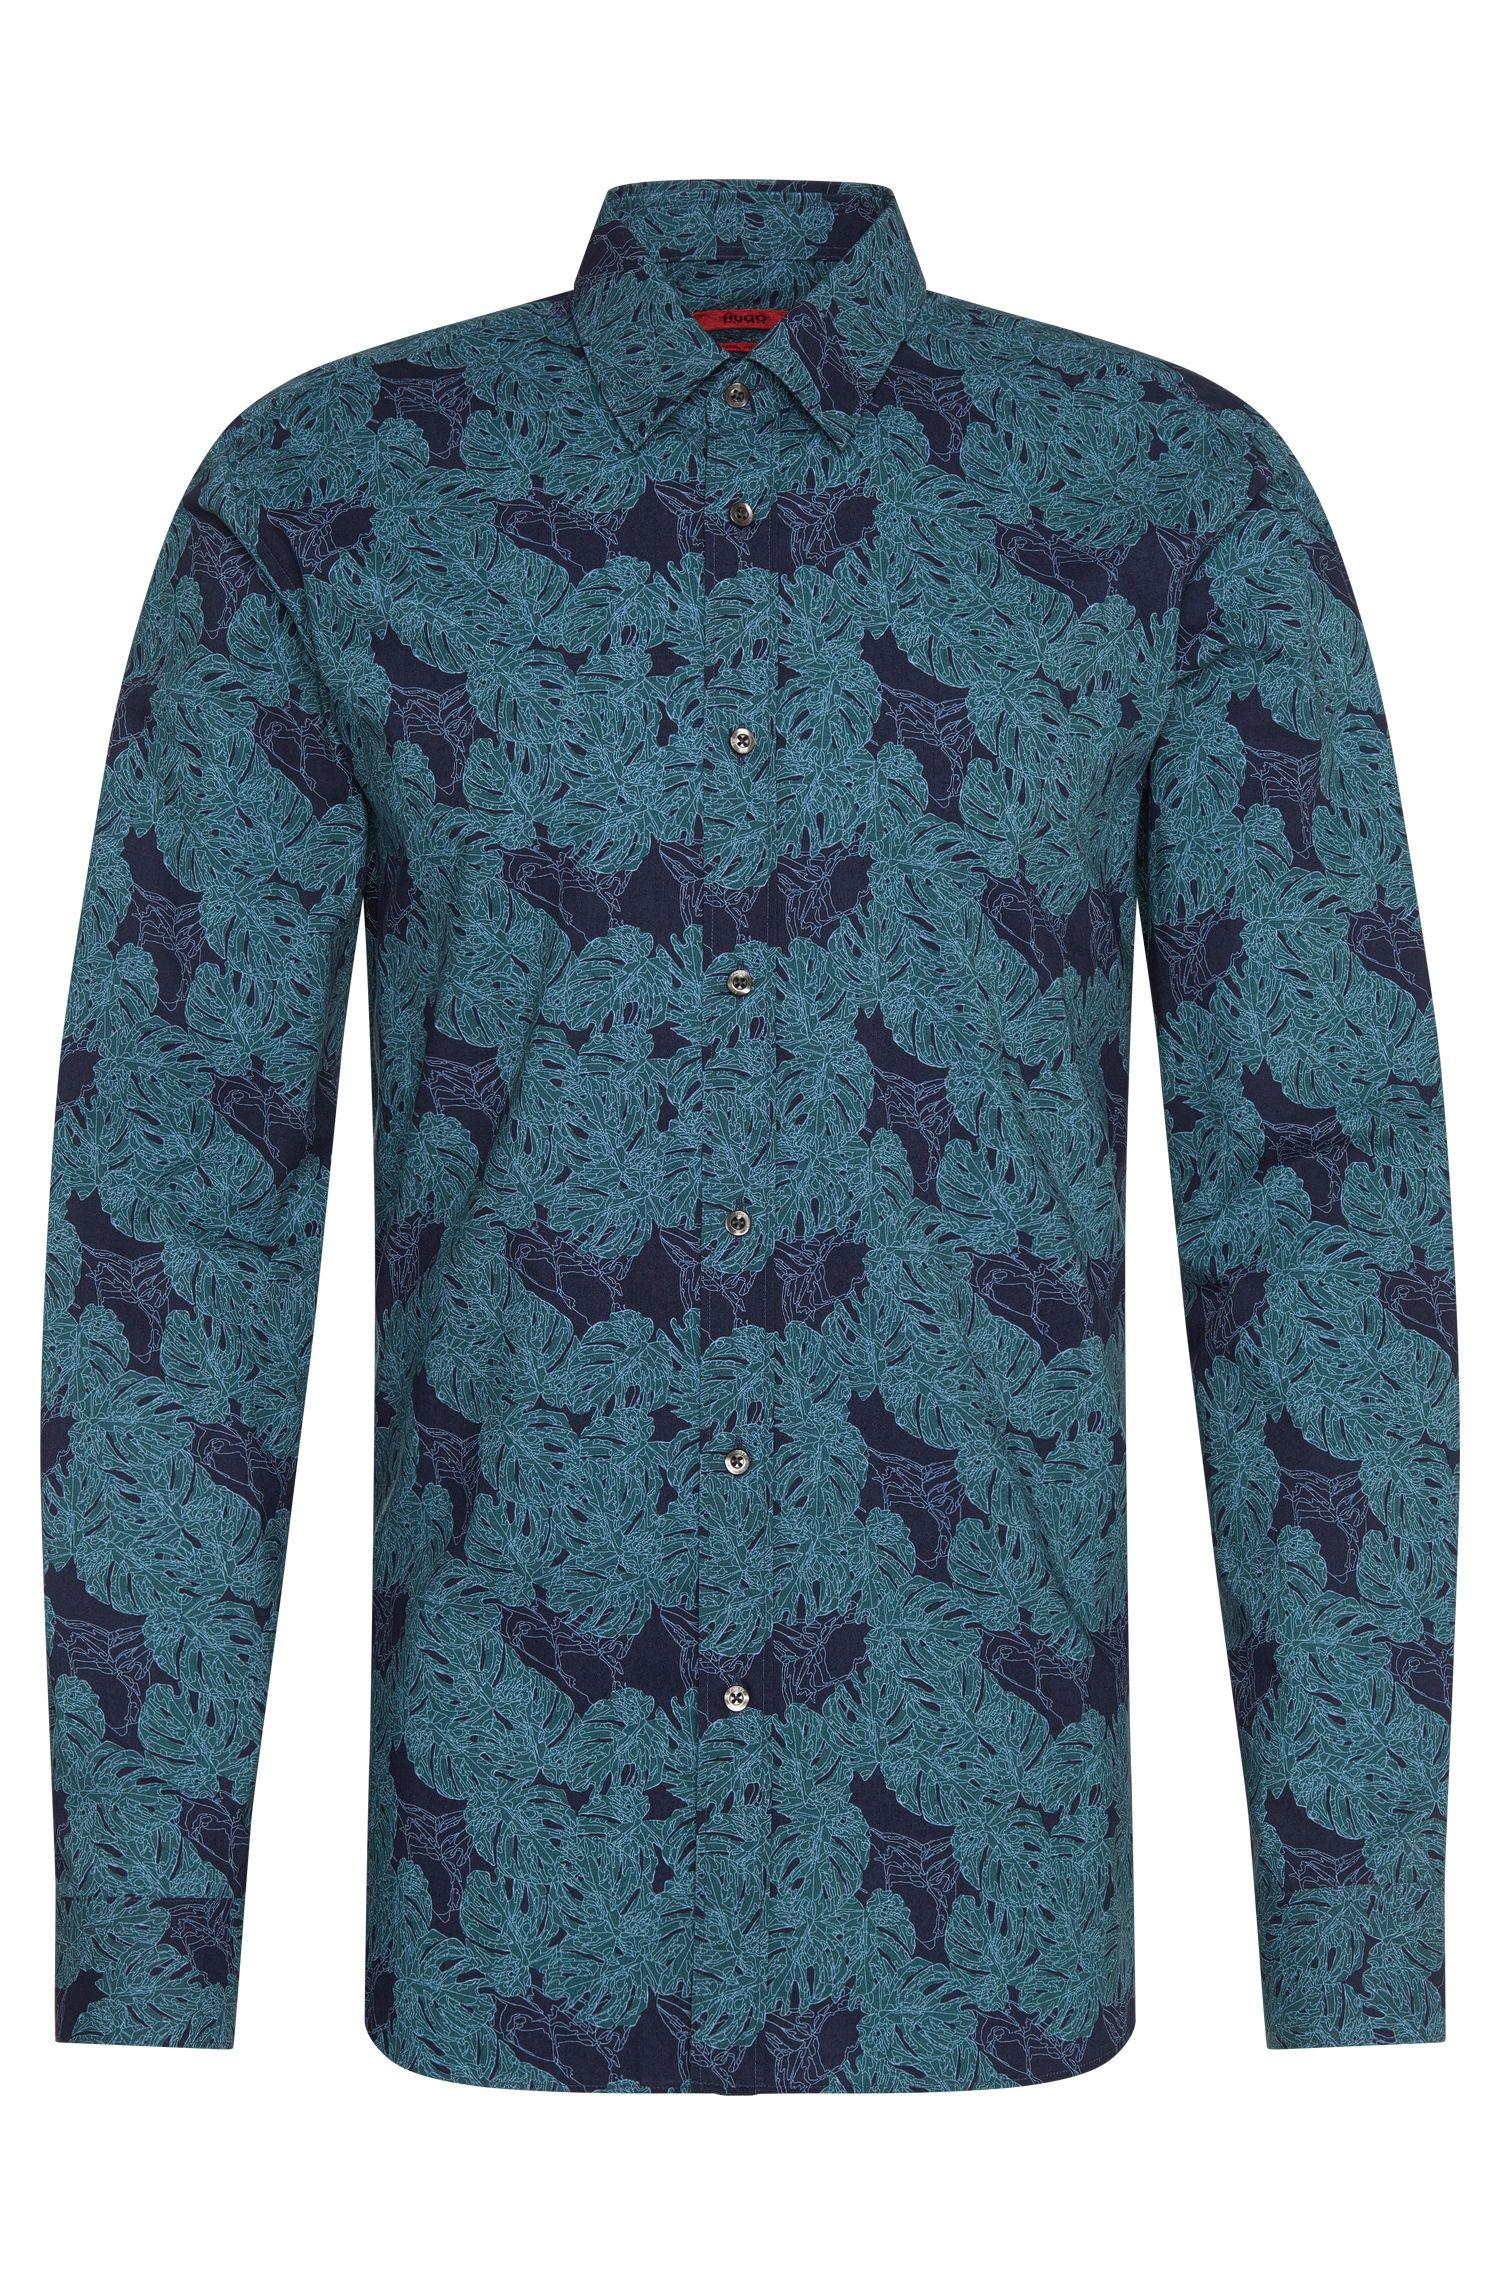 Camicia extra slim fit a disegni floreali in cotone: 'Elisha'